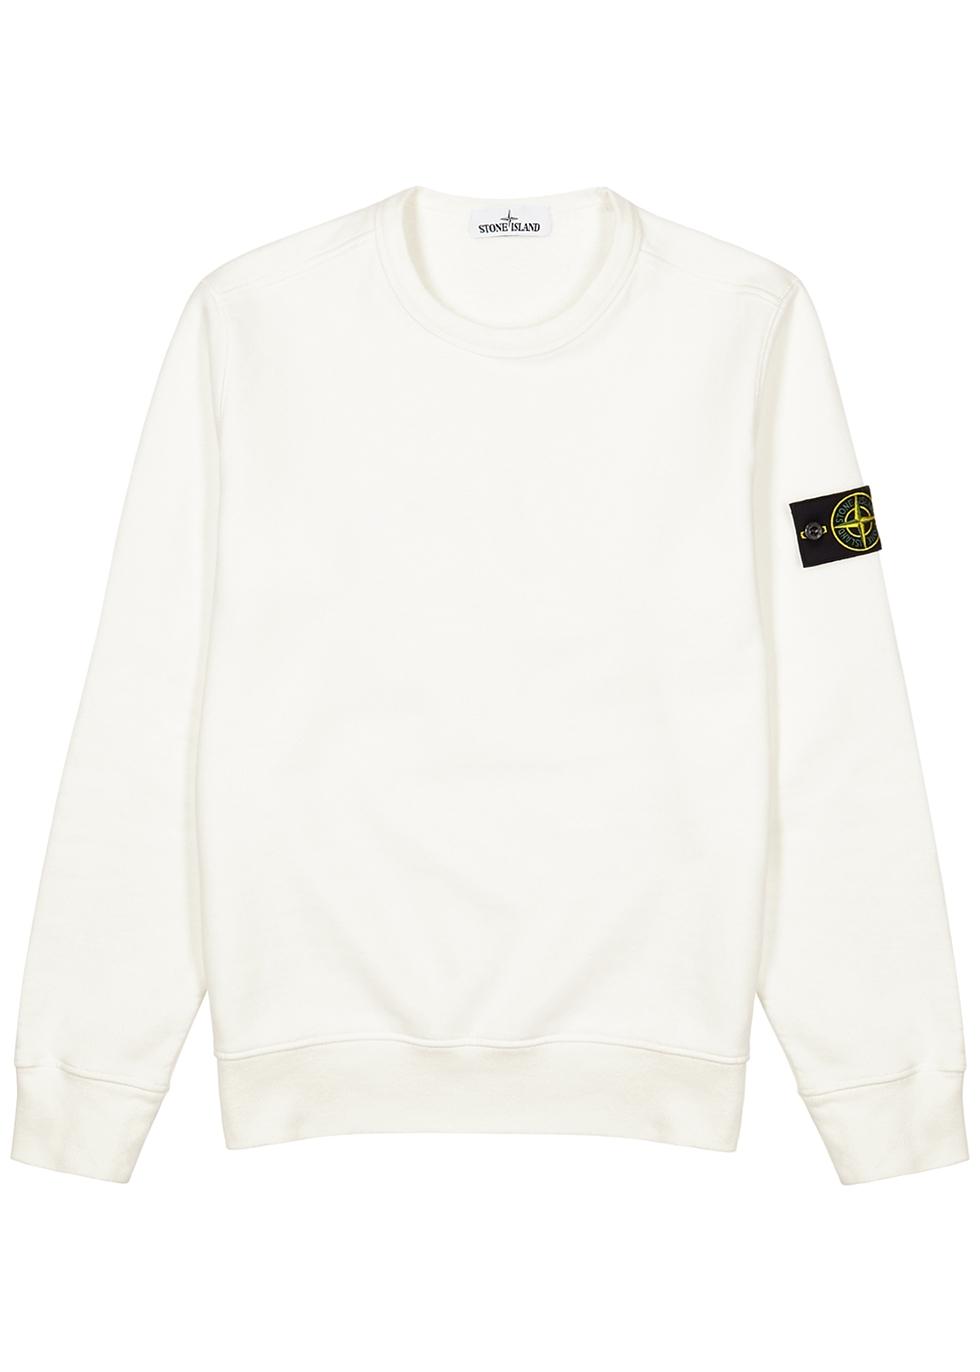 f6cc0d222f Stone Island - Men's Designer Jackets & Jeans - Harvey Nichols